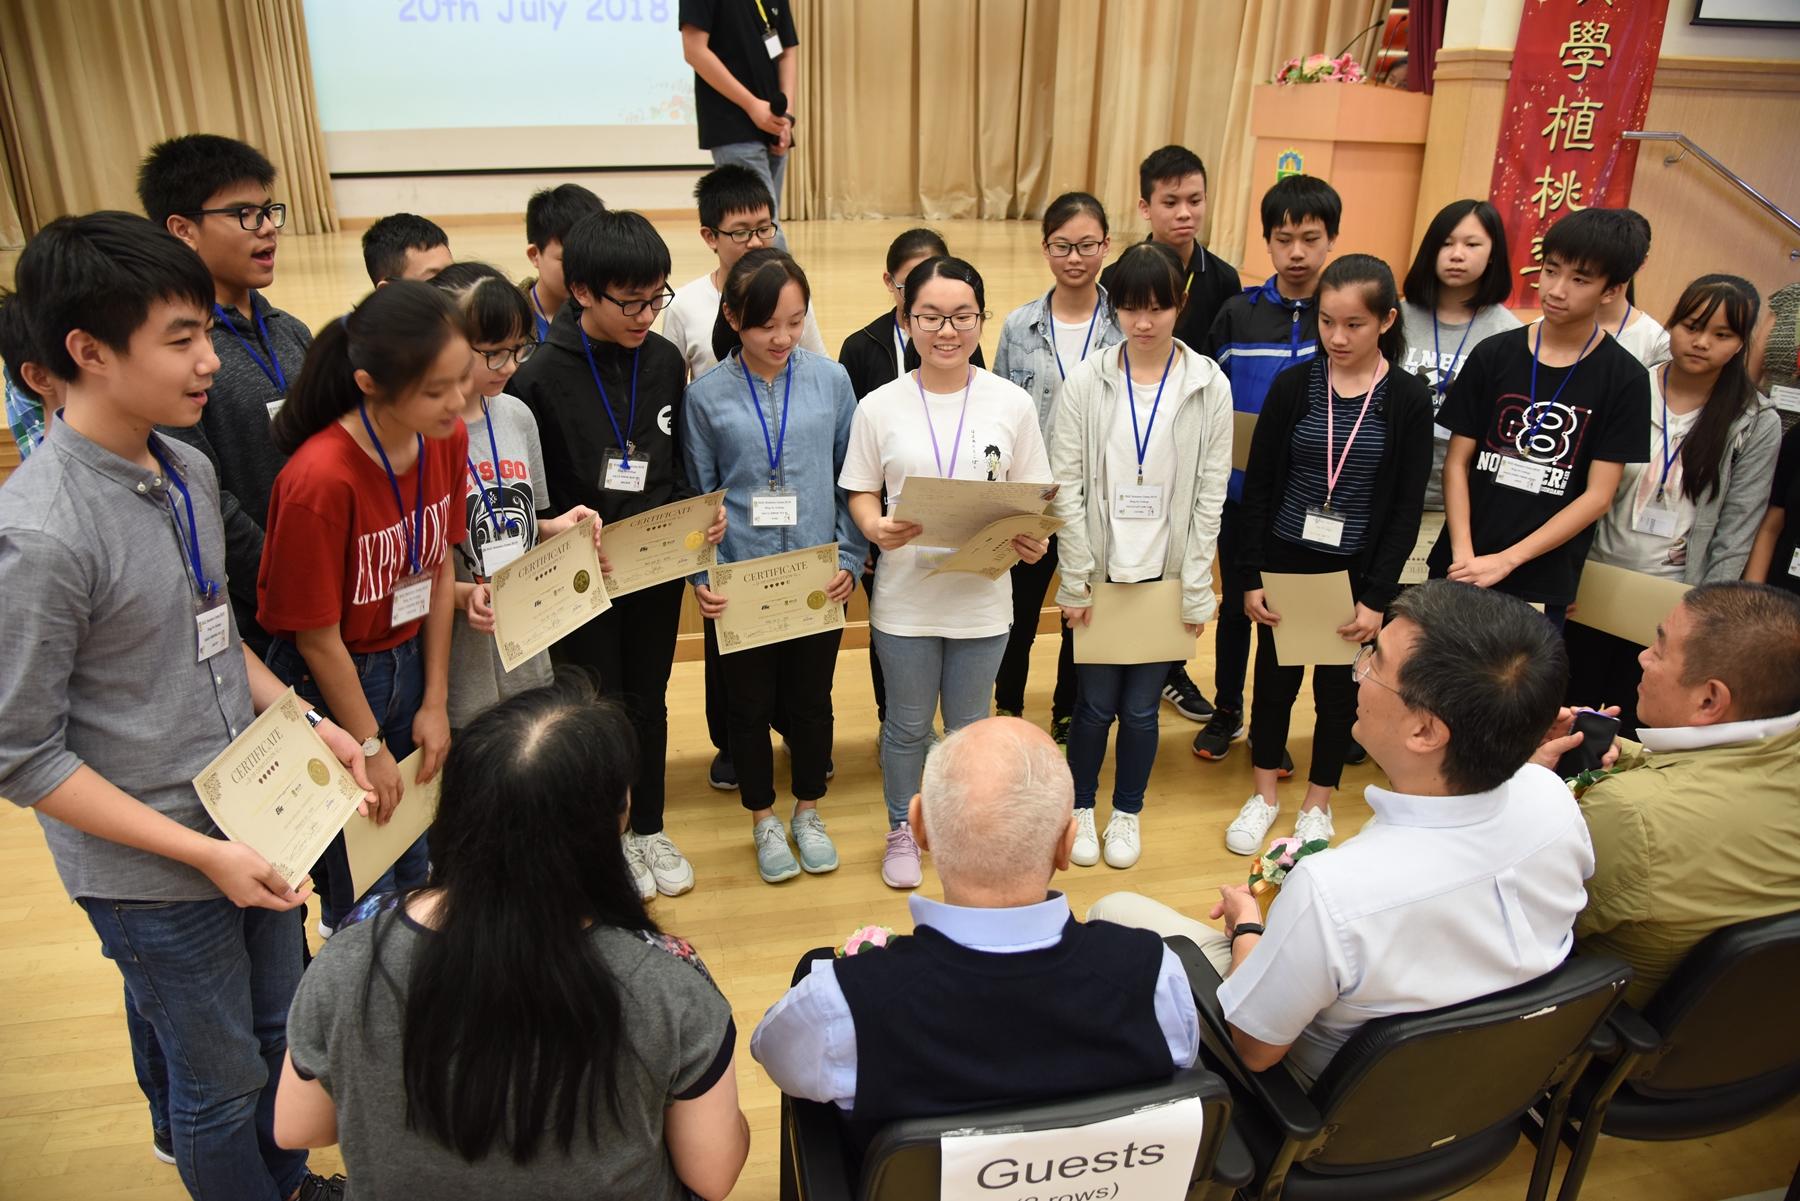 http://npc.edu.hk/sites/default/files/dsc_4728.jpg